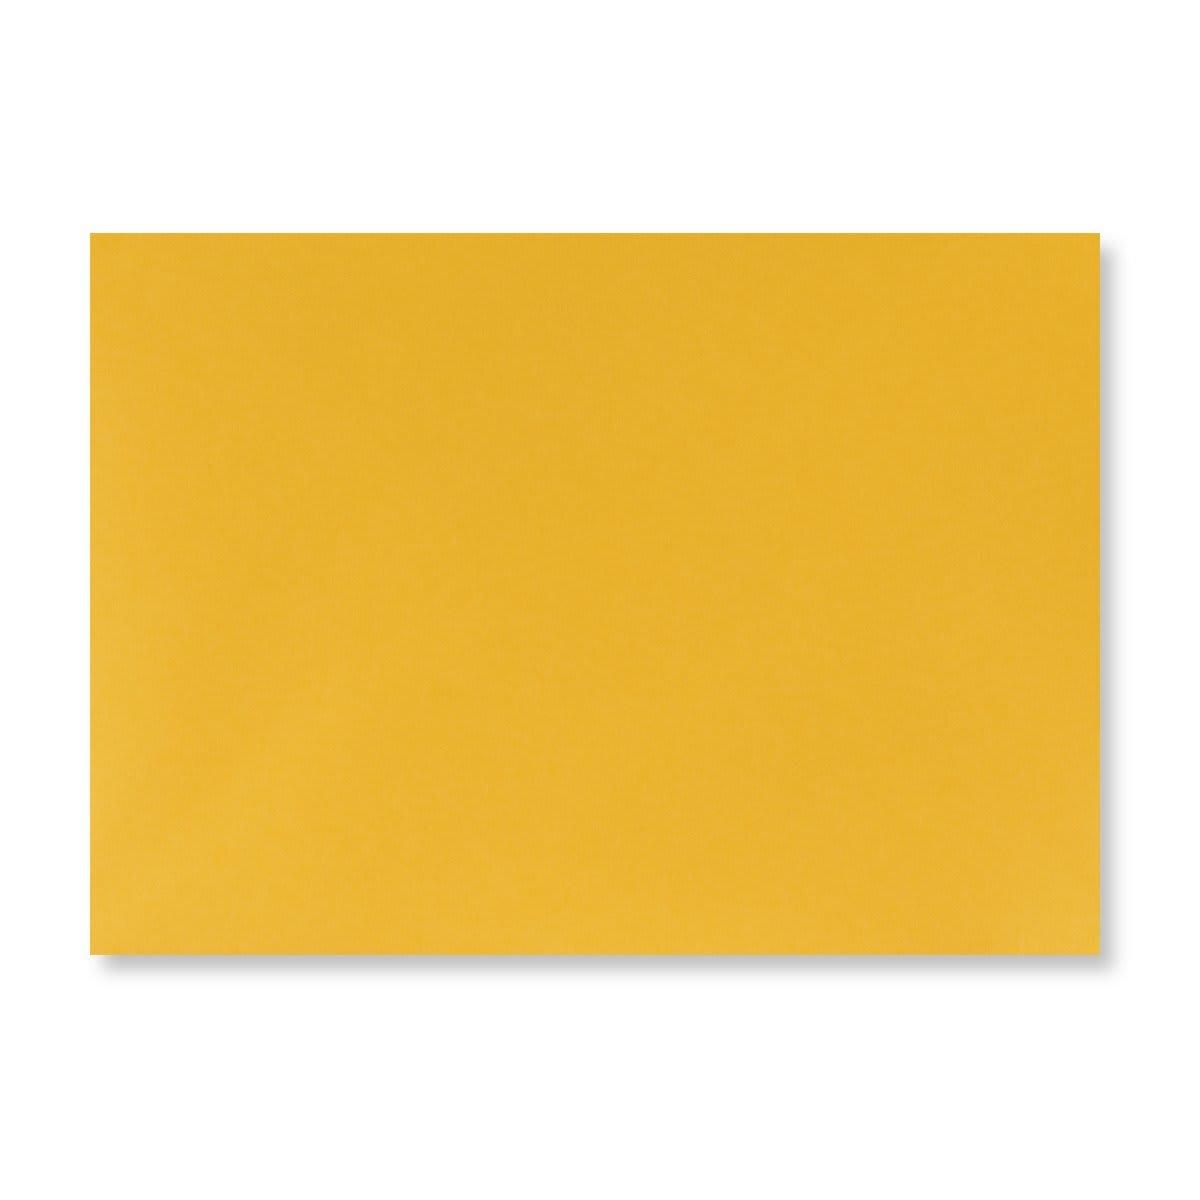 GOLDEN YELLOW 125 x 175mm ENVELOPES